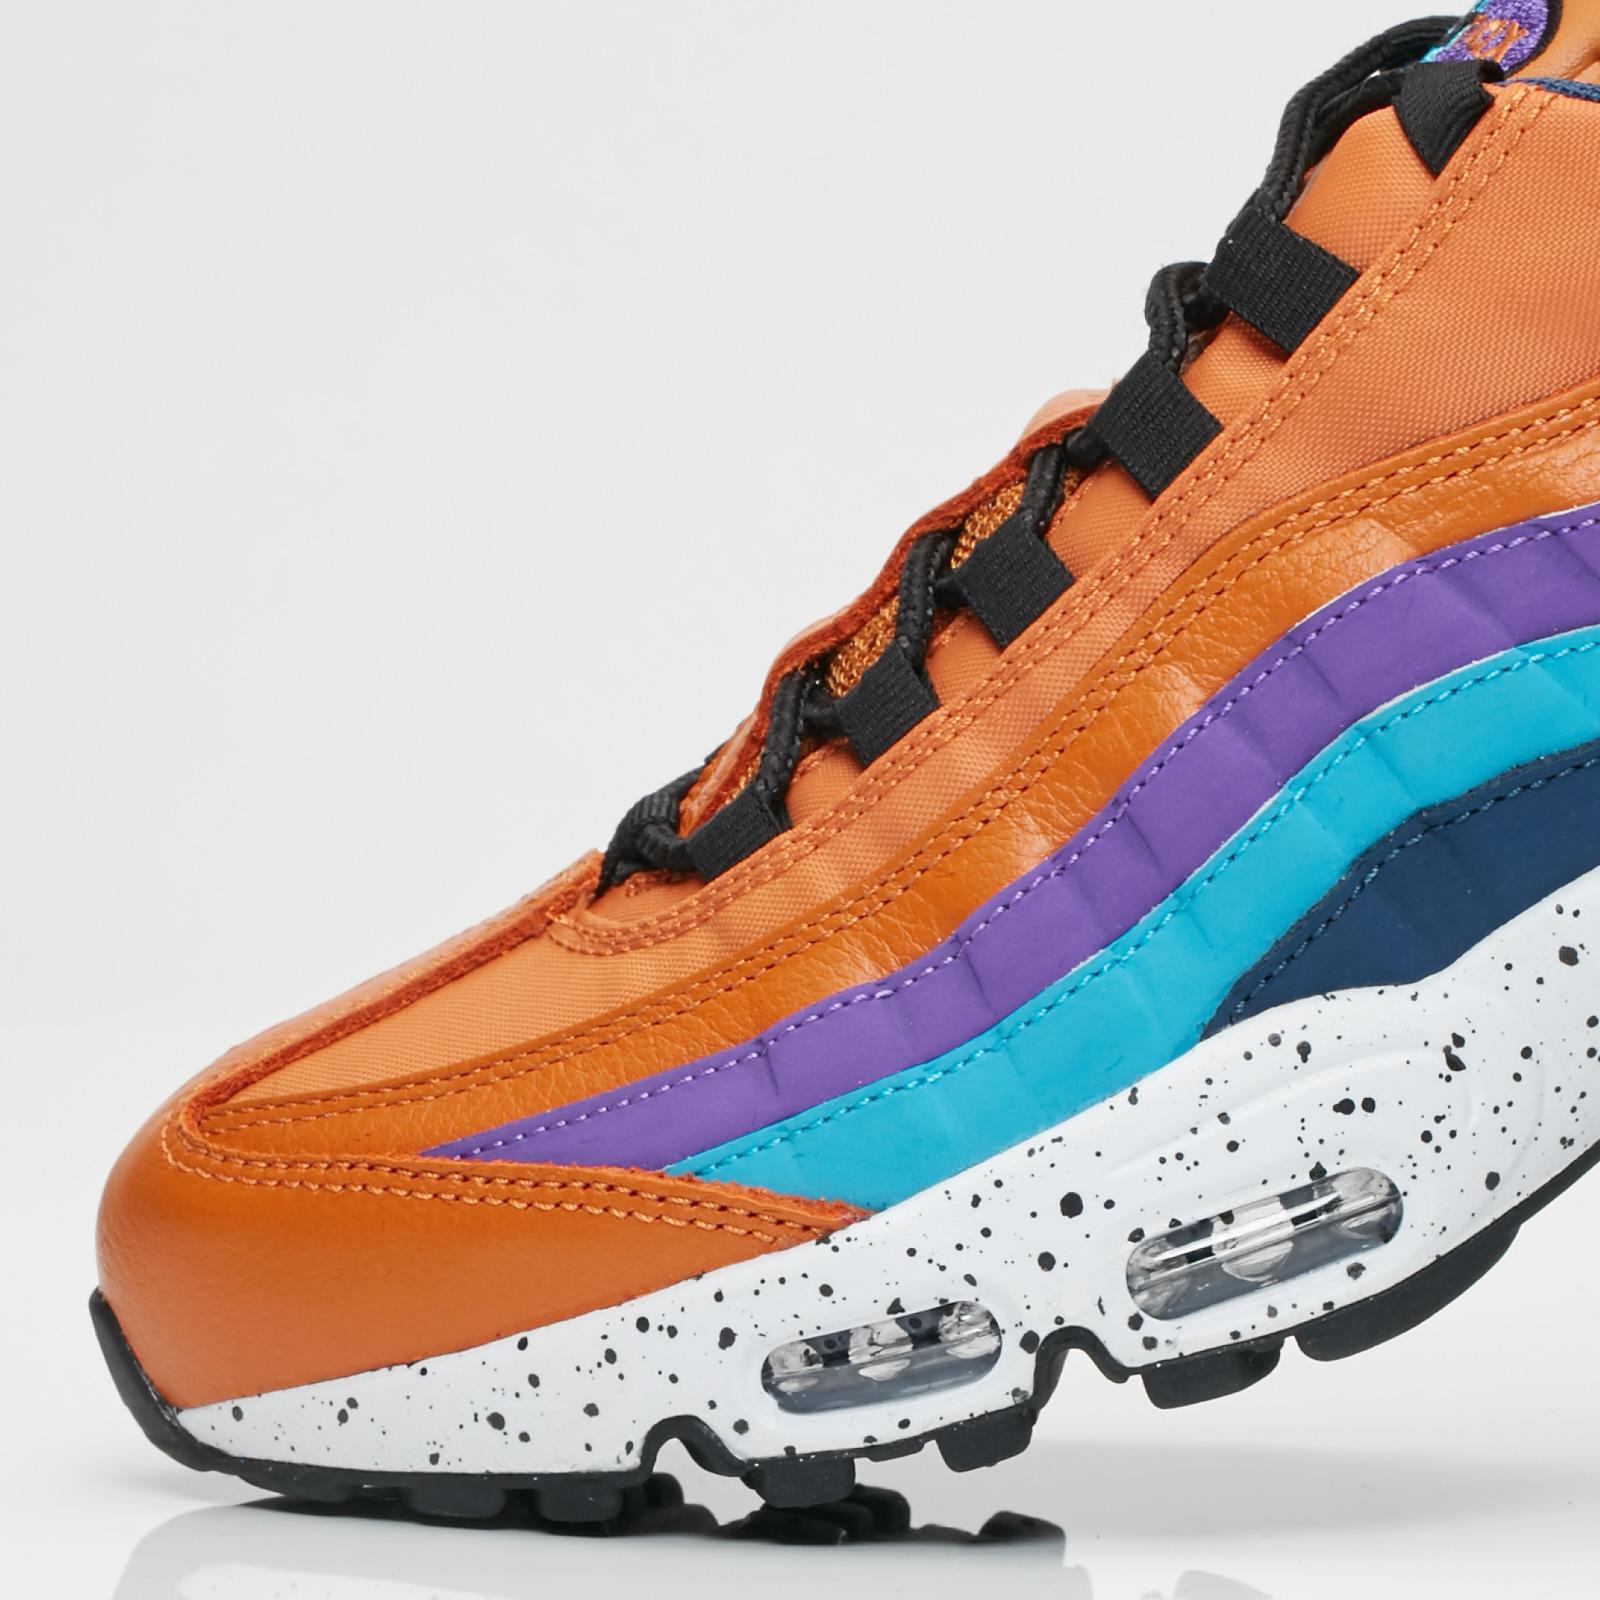 new arrival 1e29e ad77d Nike Sportswear Air Max 95 Premium - 6. Close